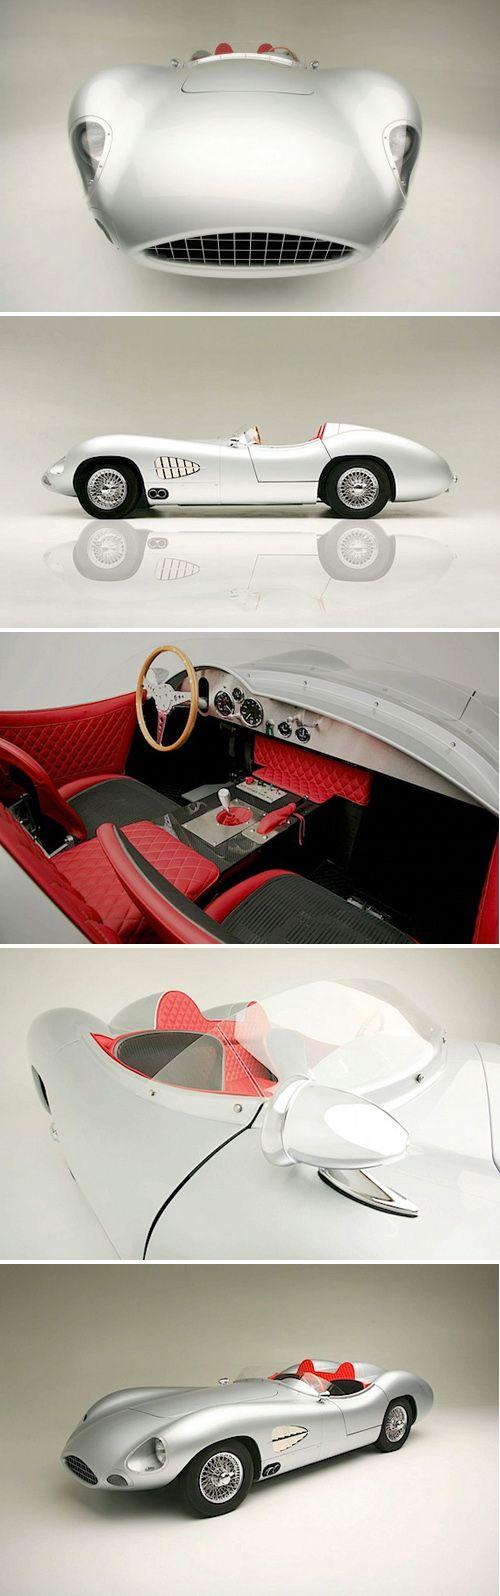 Aston Martin 1957